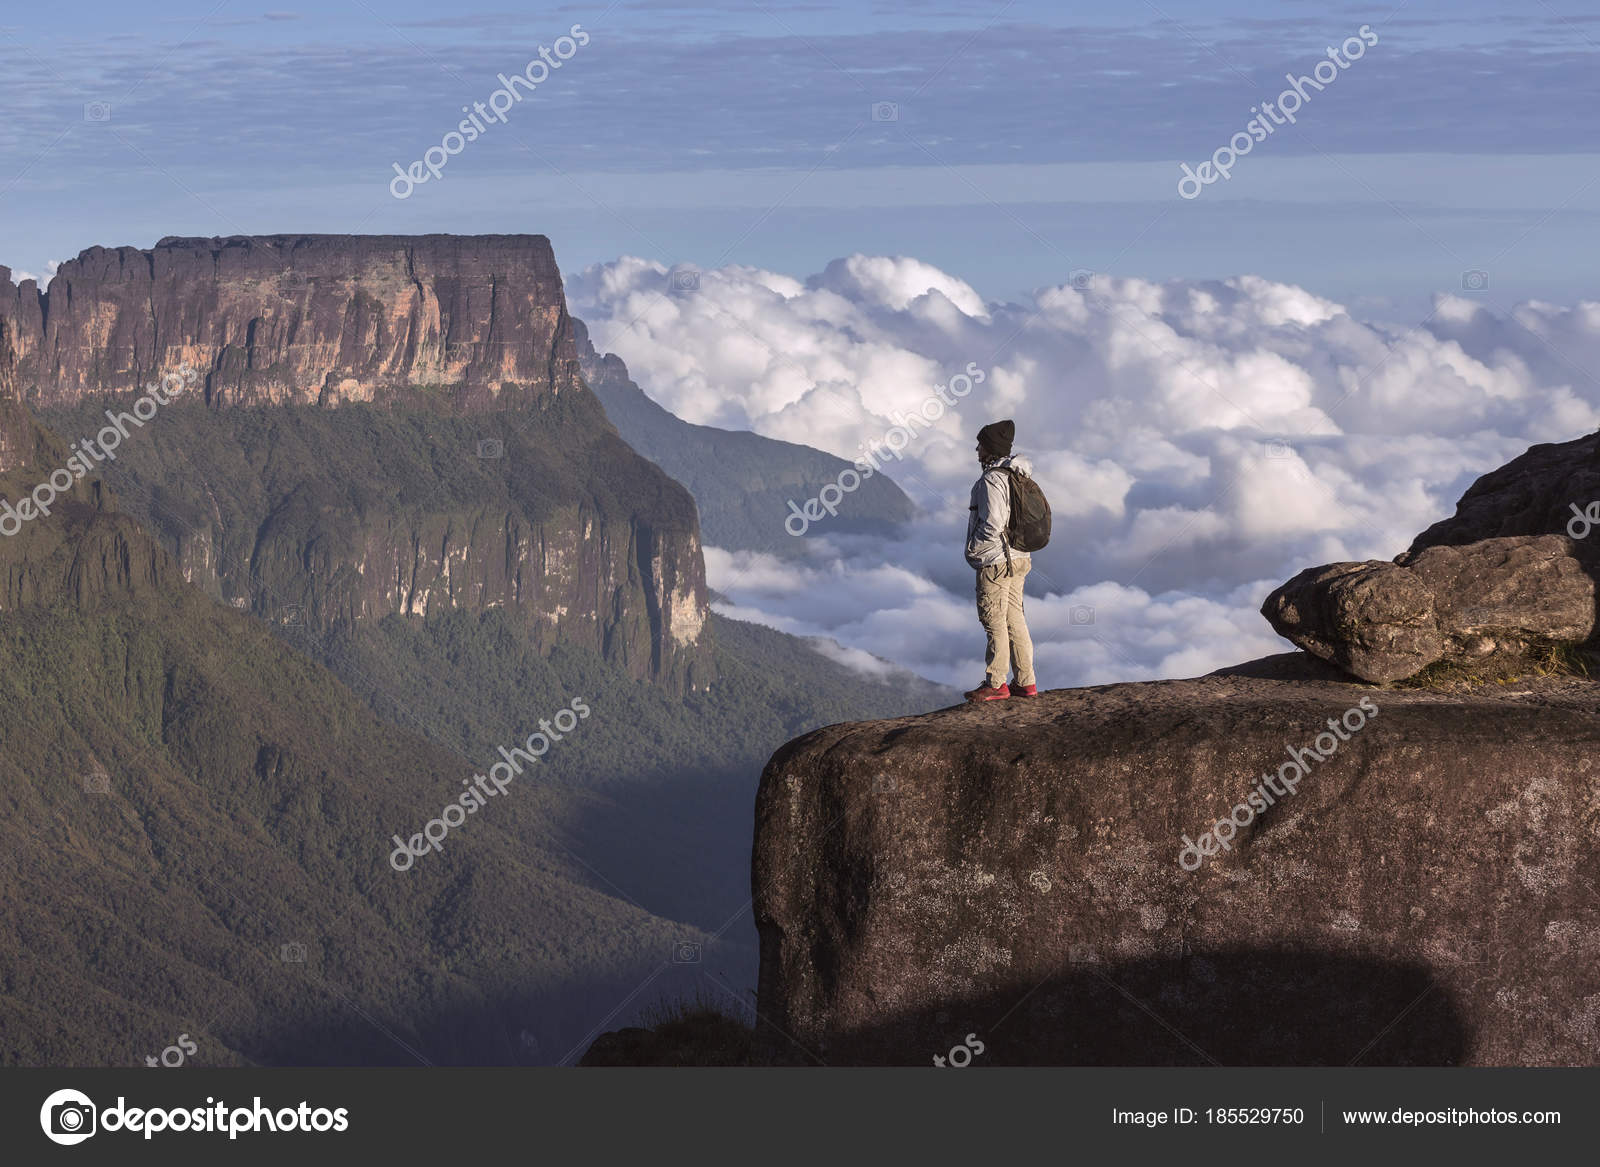 La Ventana Die Berge Roraima Und Kukenan Venezuela Stockfoto